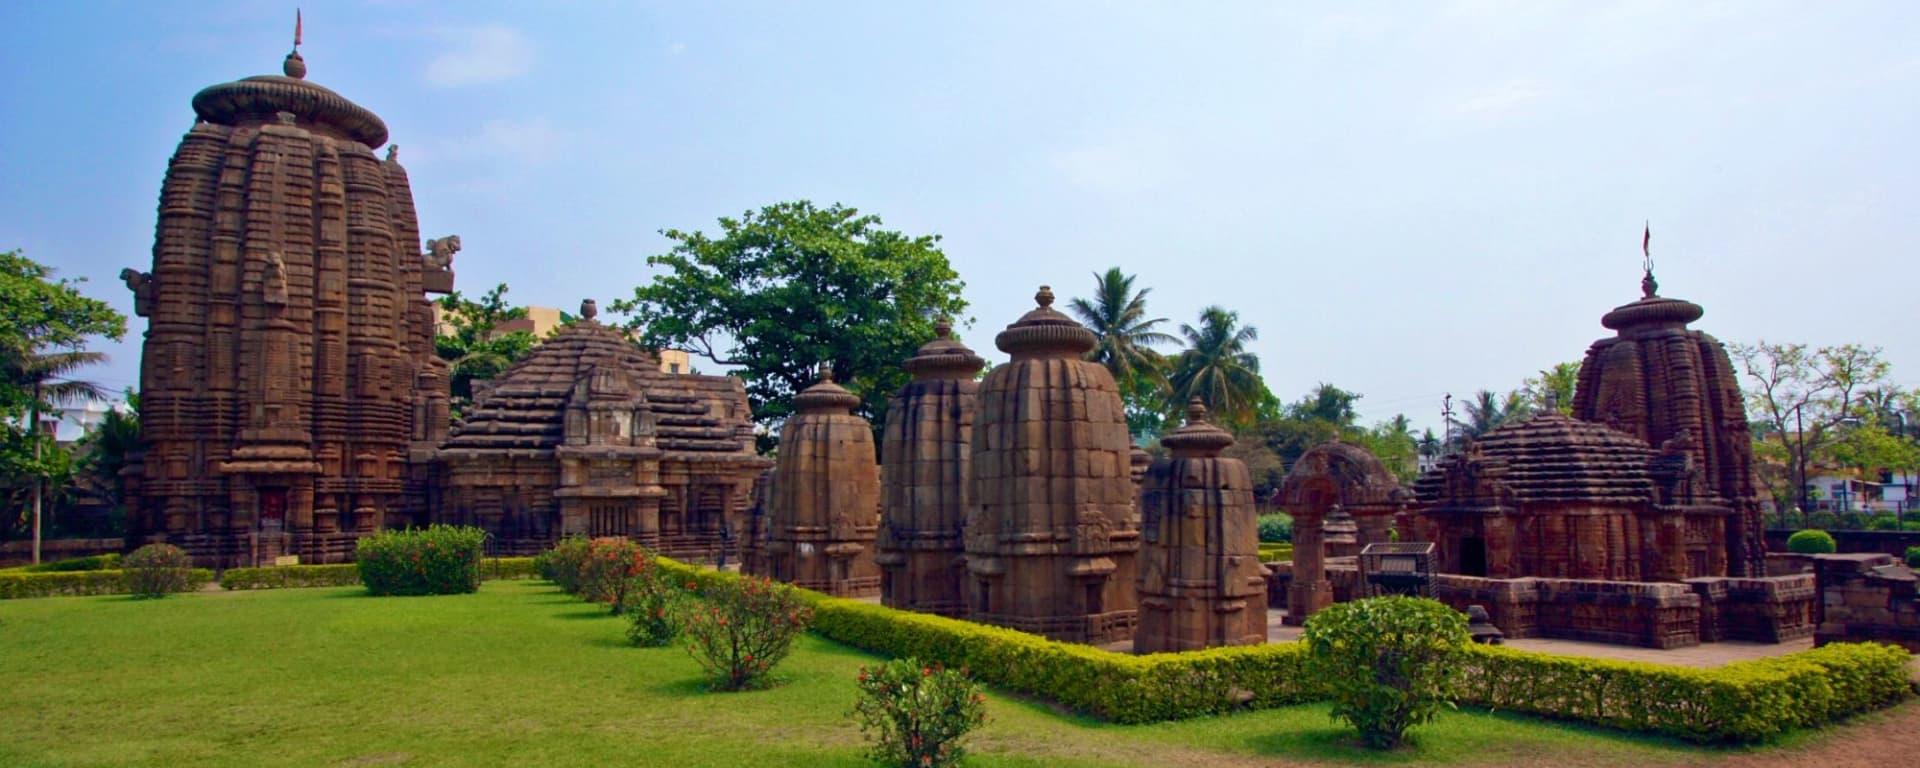 Odisha, terre des temples de Bhubaneswar: Temples Bhubaneswar